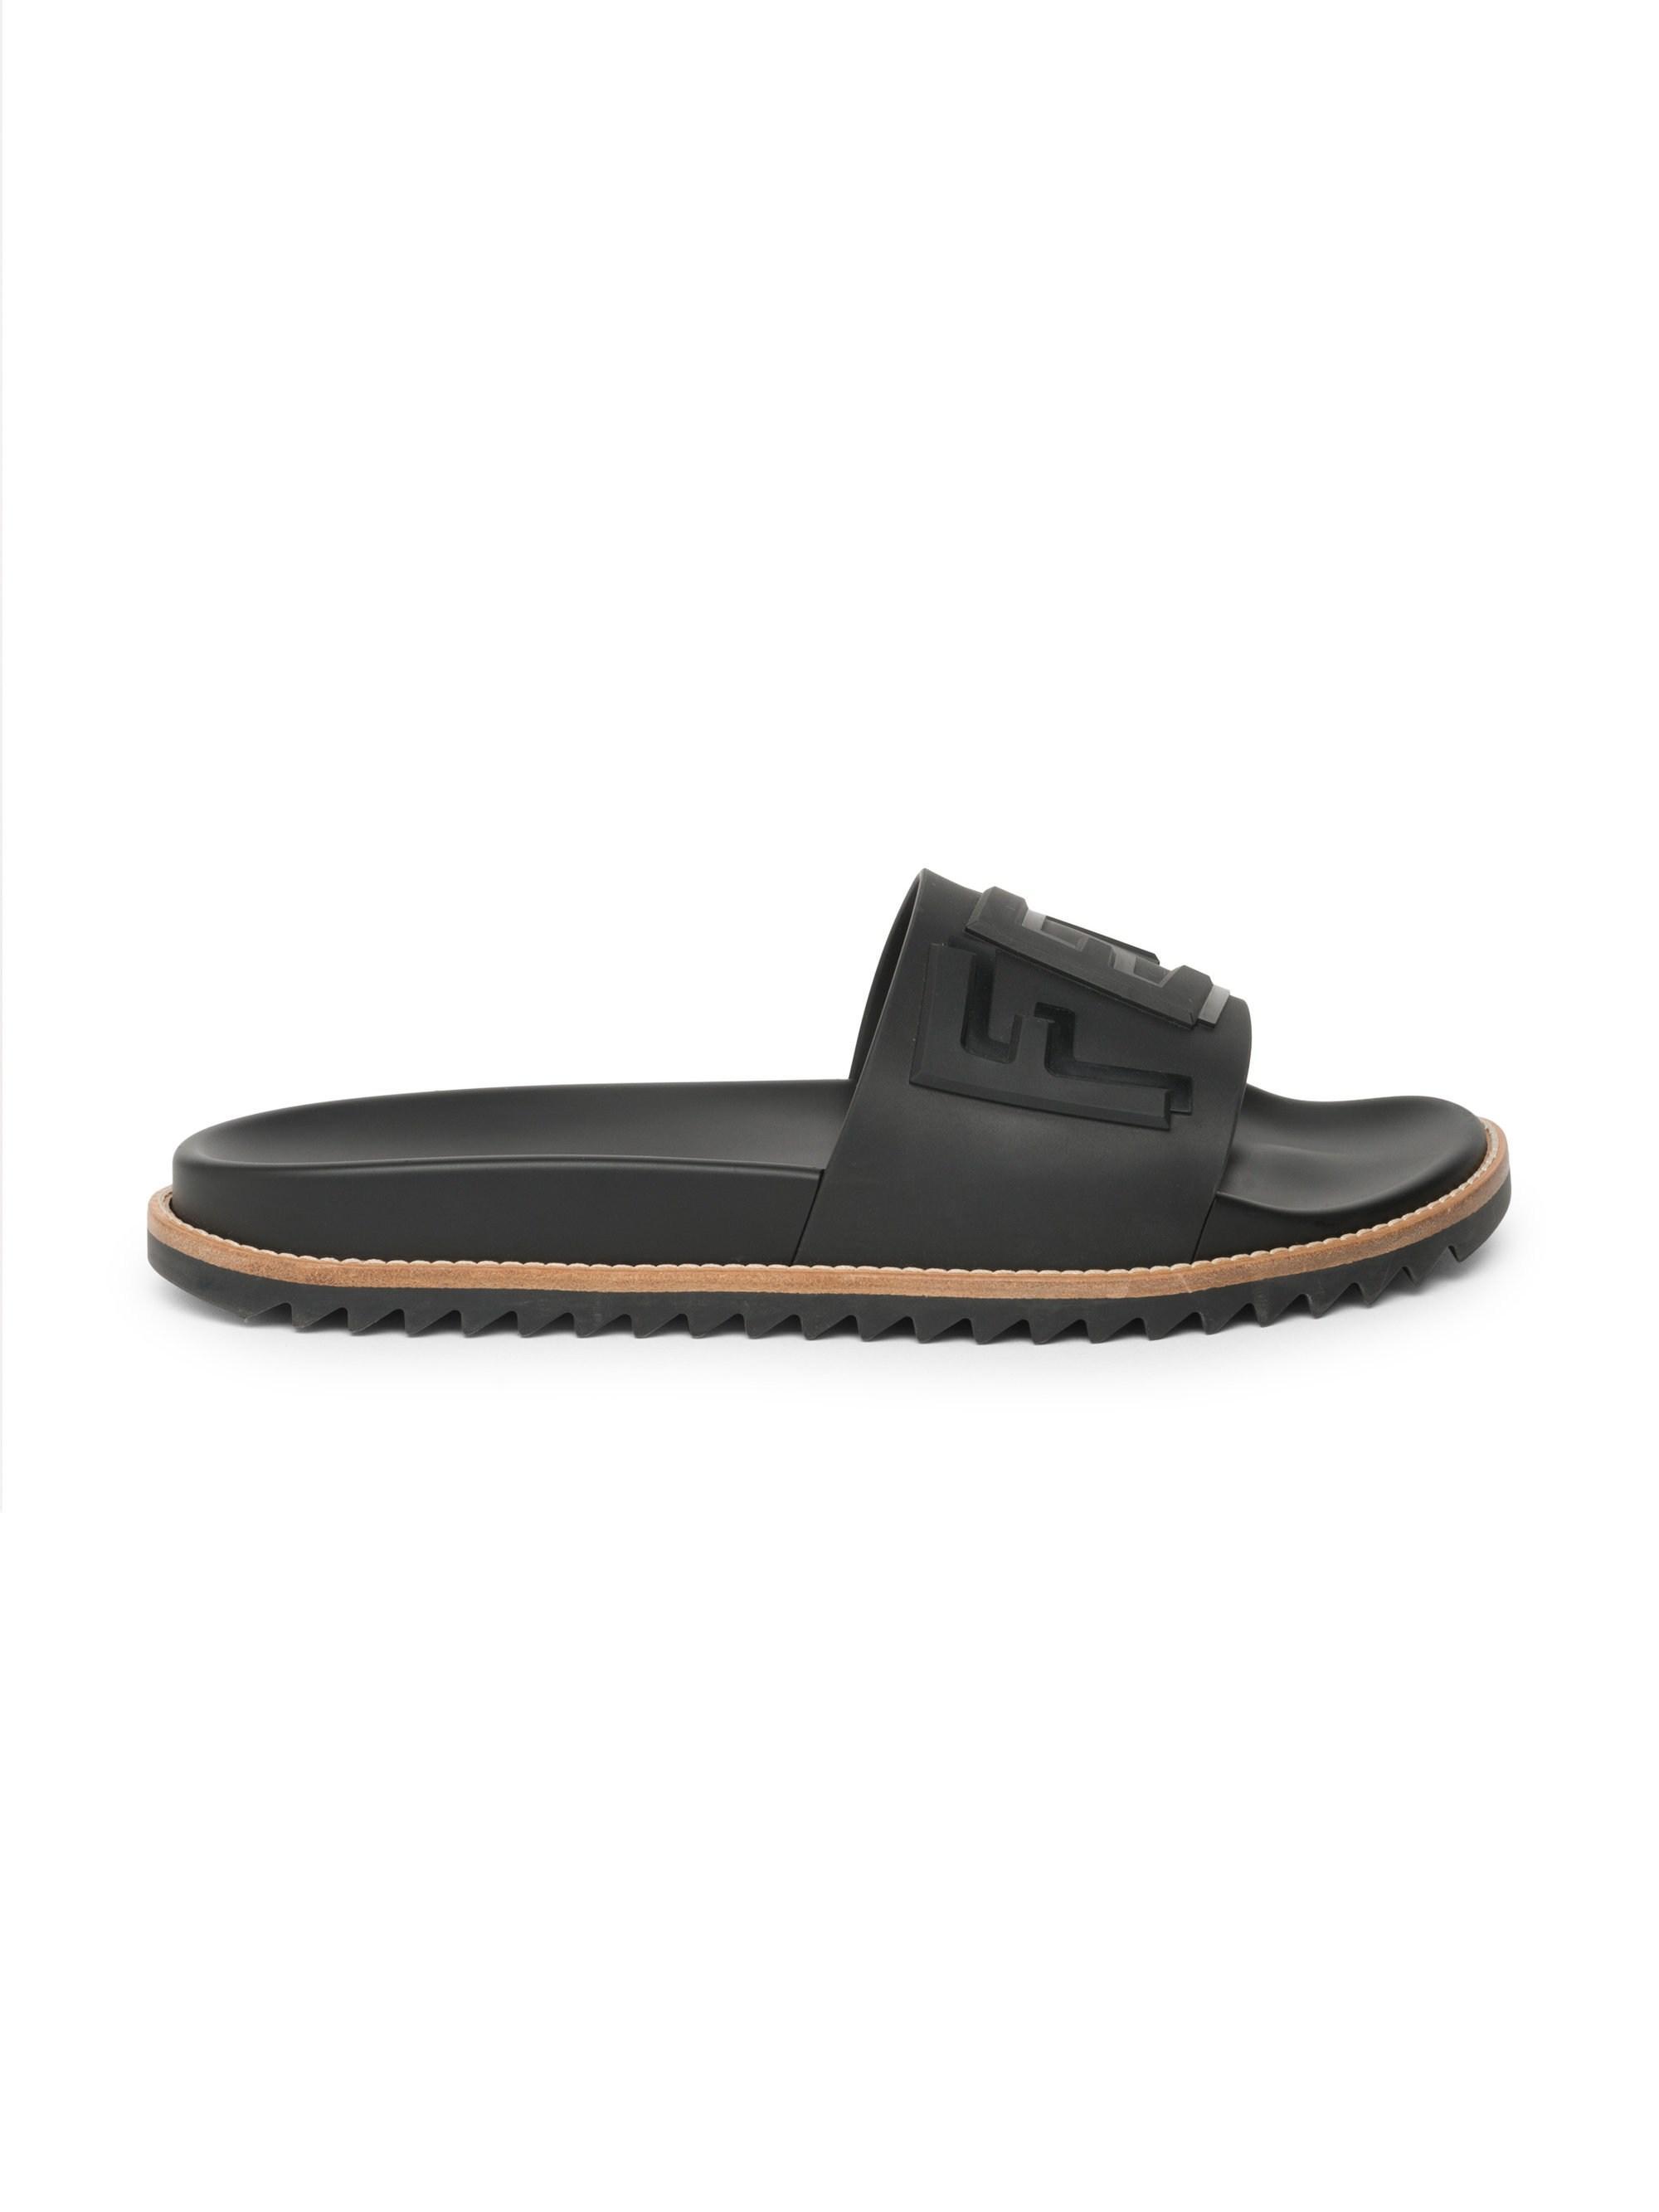 91c068a4 Lyst - Fendi Logo Embossed Slide Sandals in Black